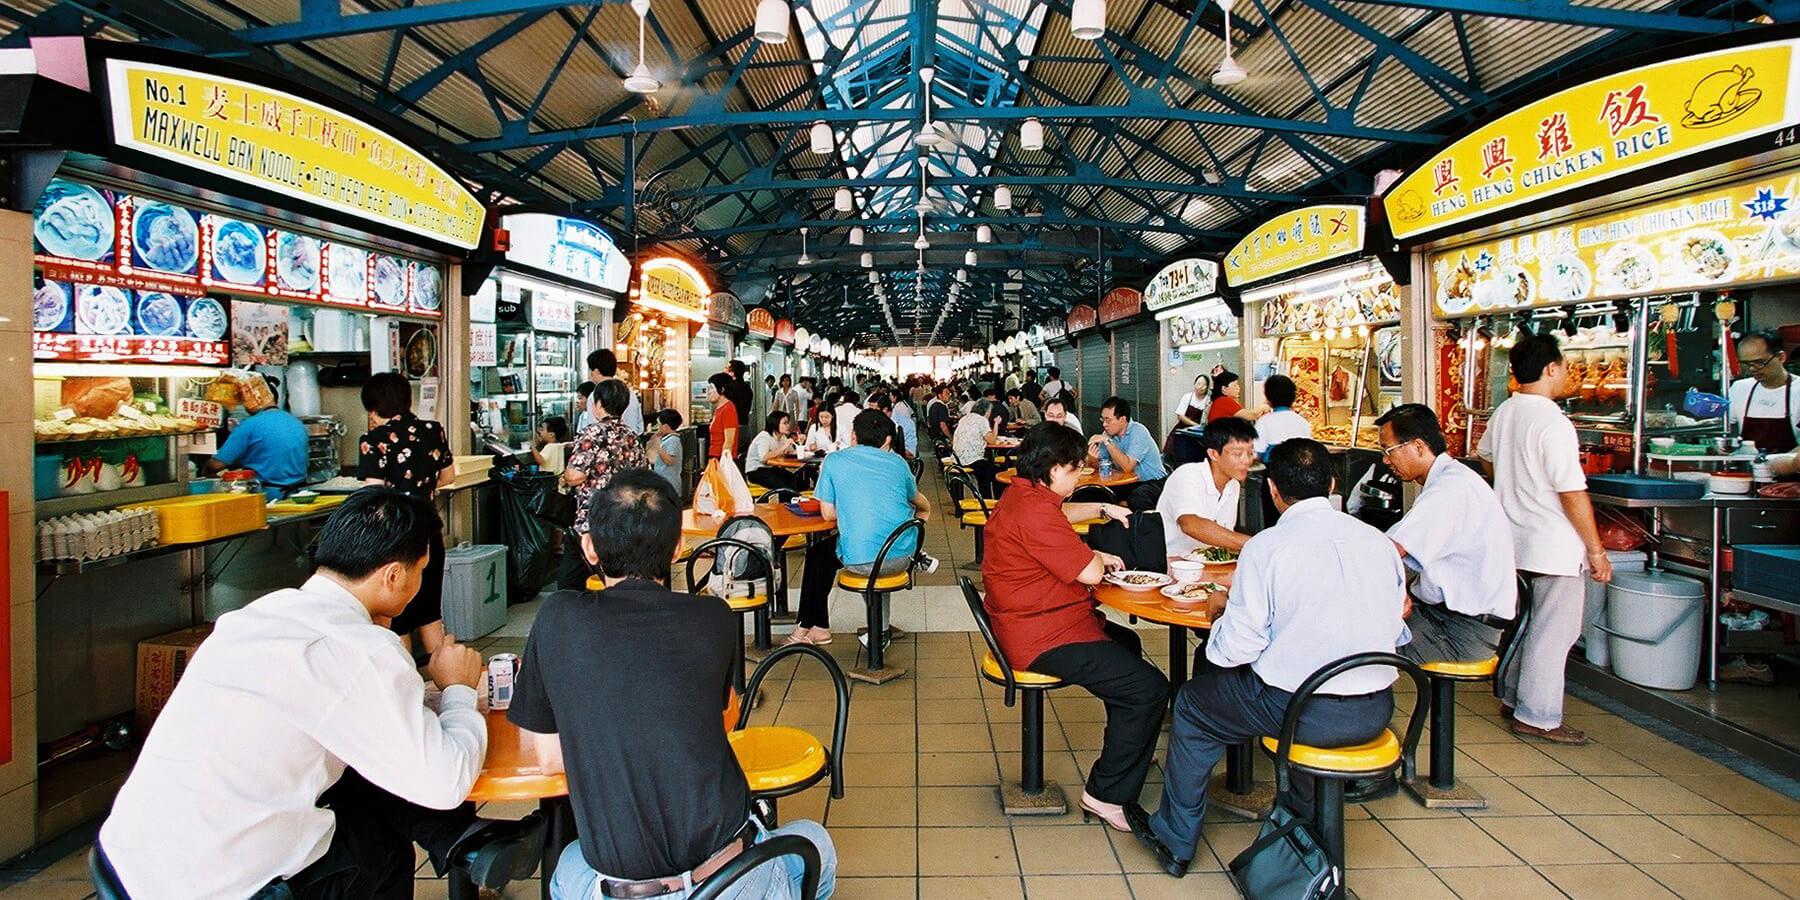 Singapur Hawker Center